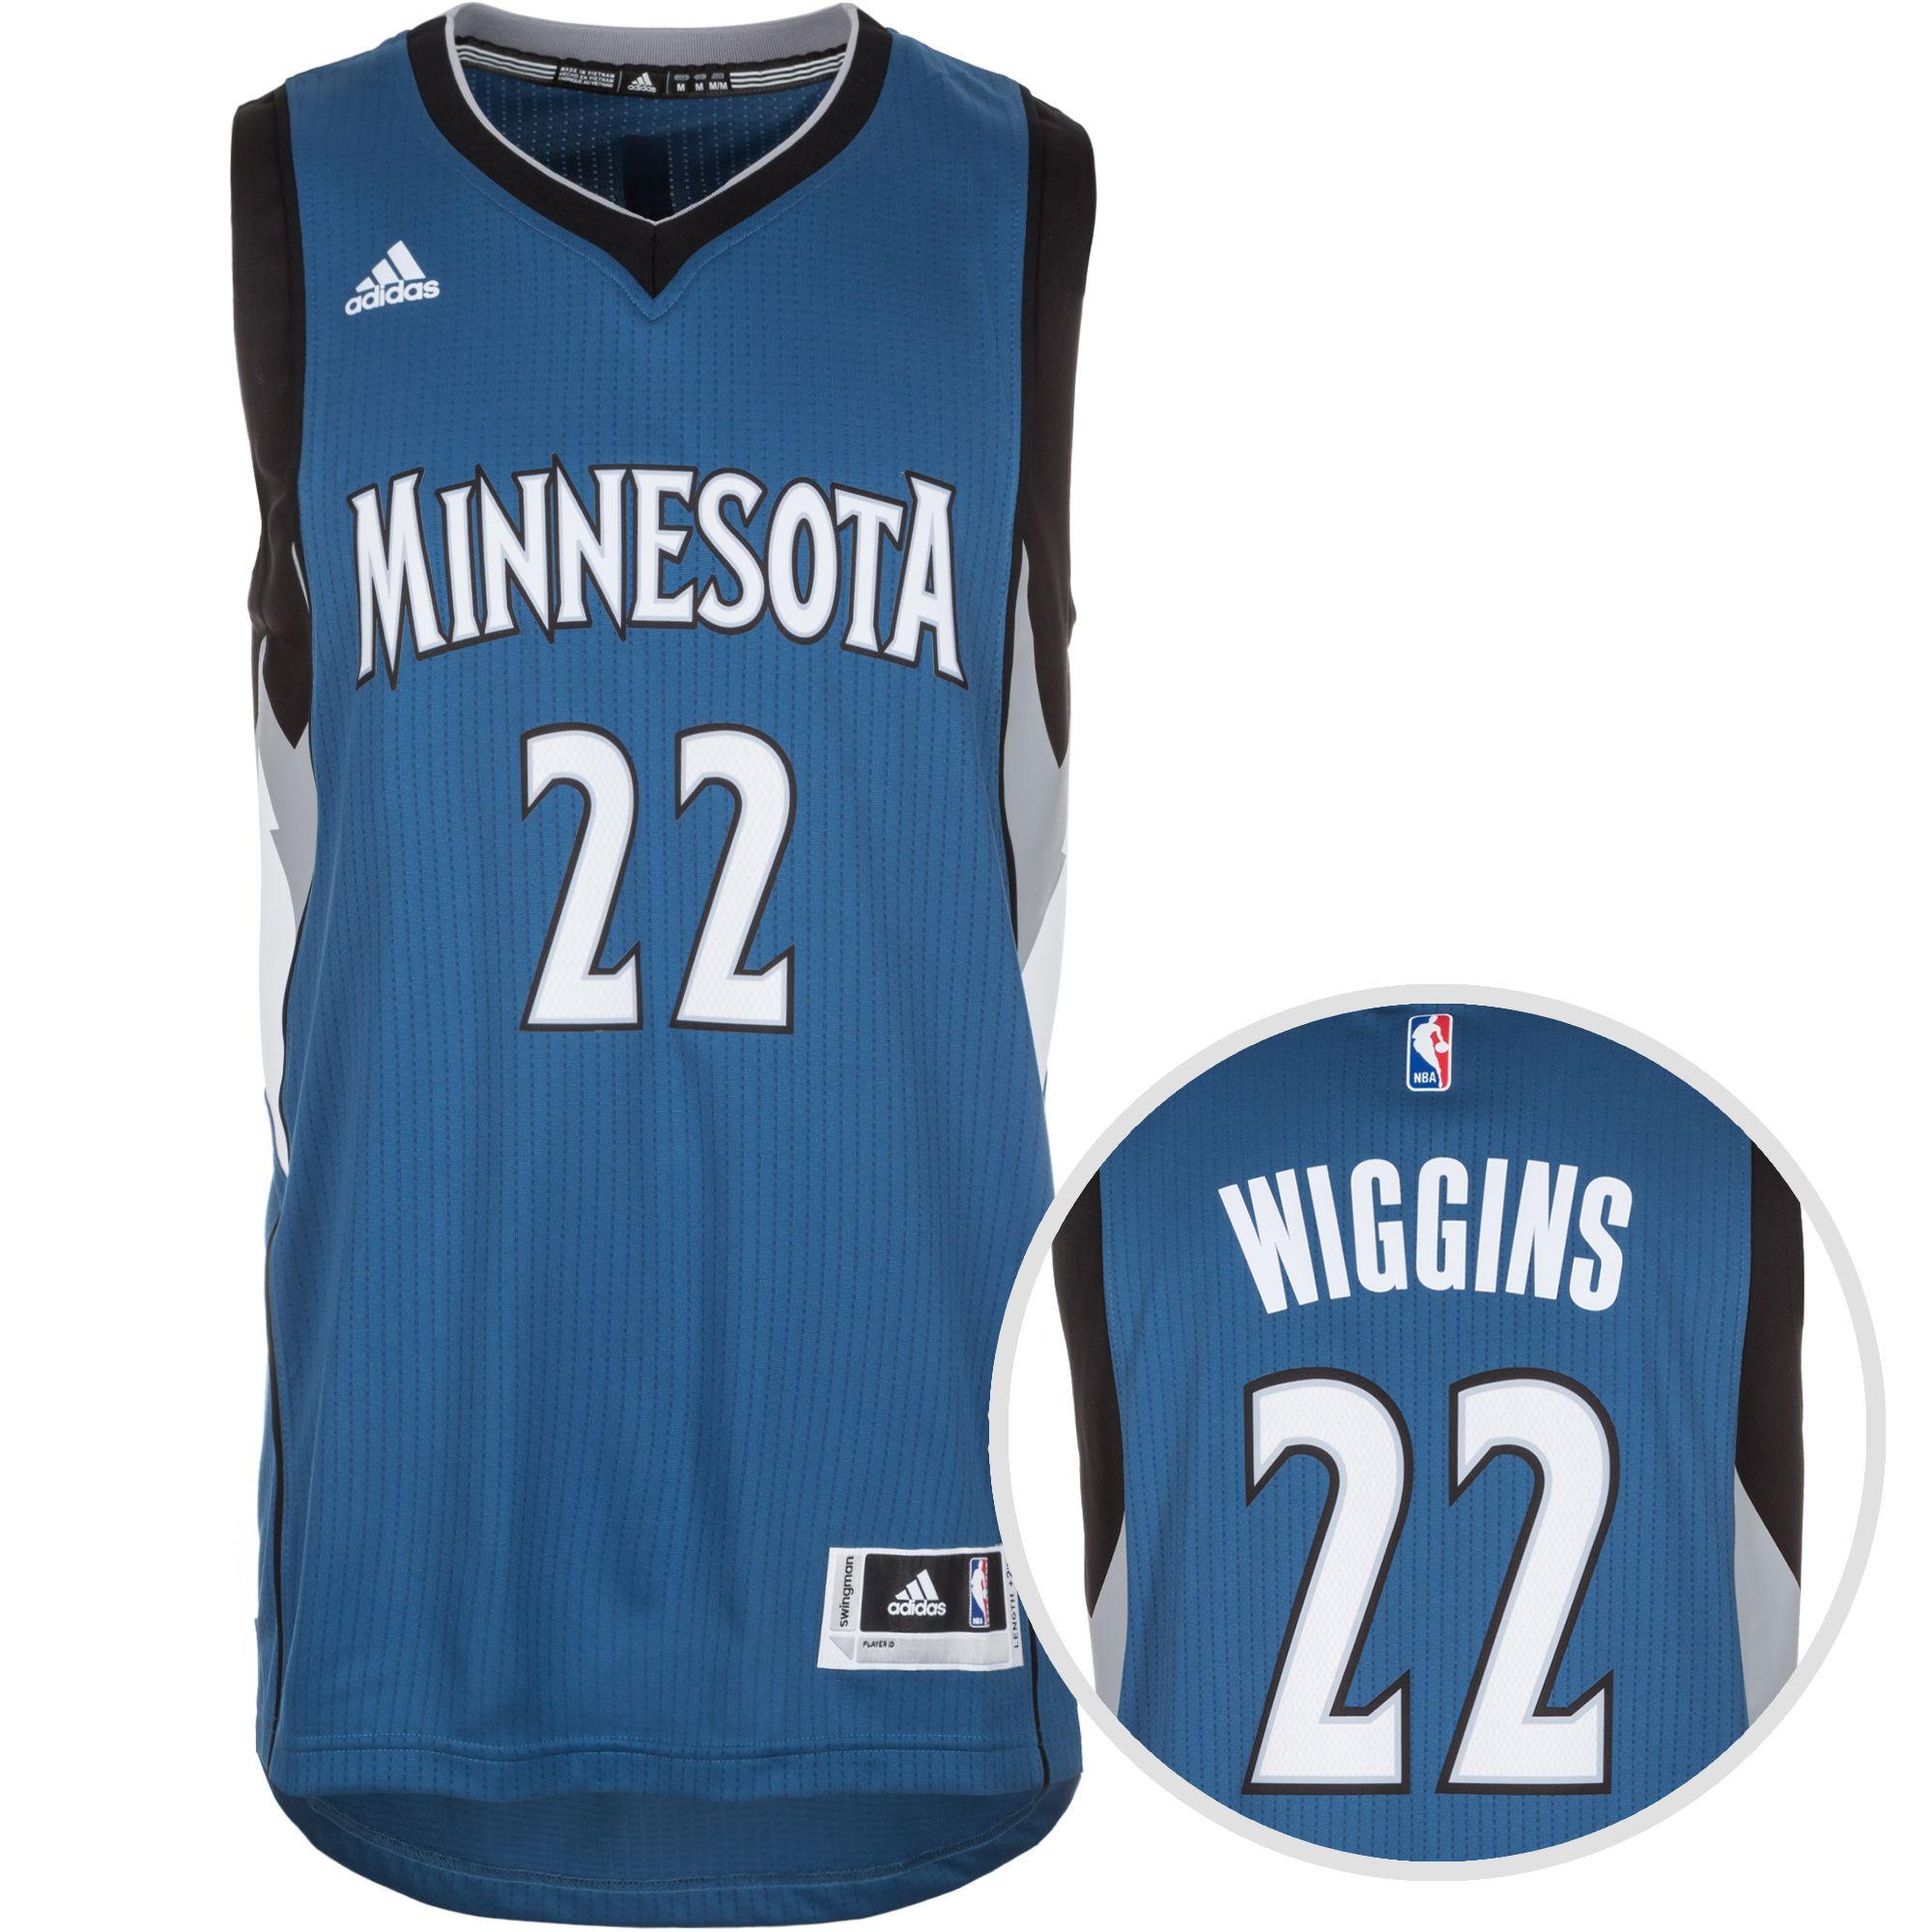 ADIDAS PERFORMANCE adidas Performance Minnesota Timberwolves Wiggins Swingman Basketballtrikot Herren